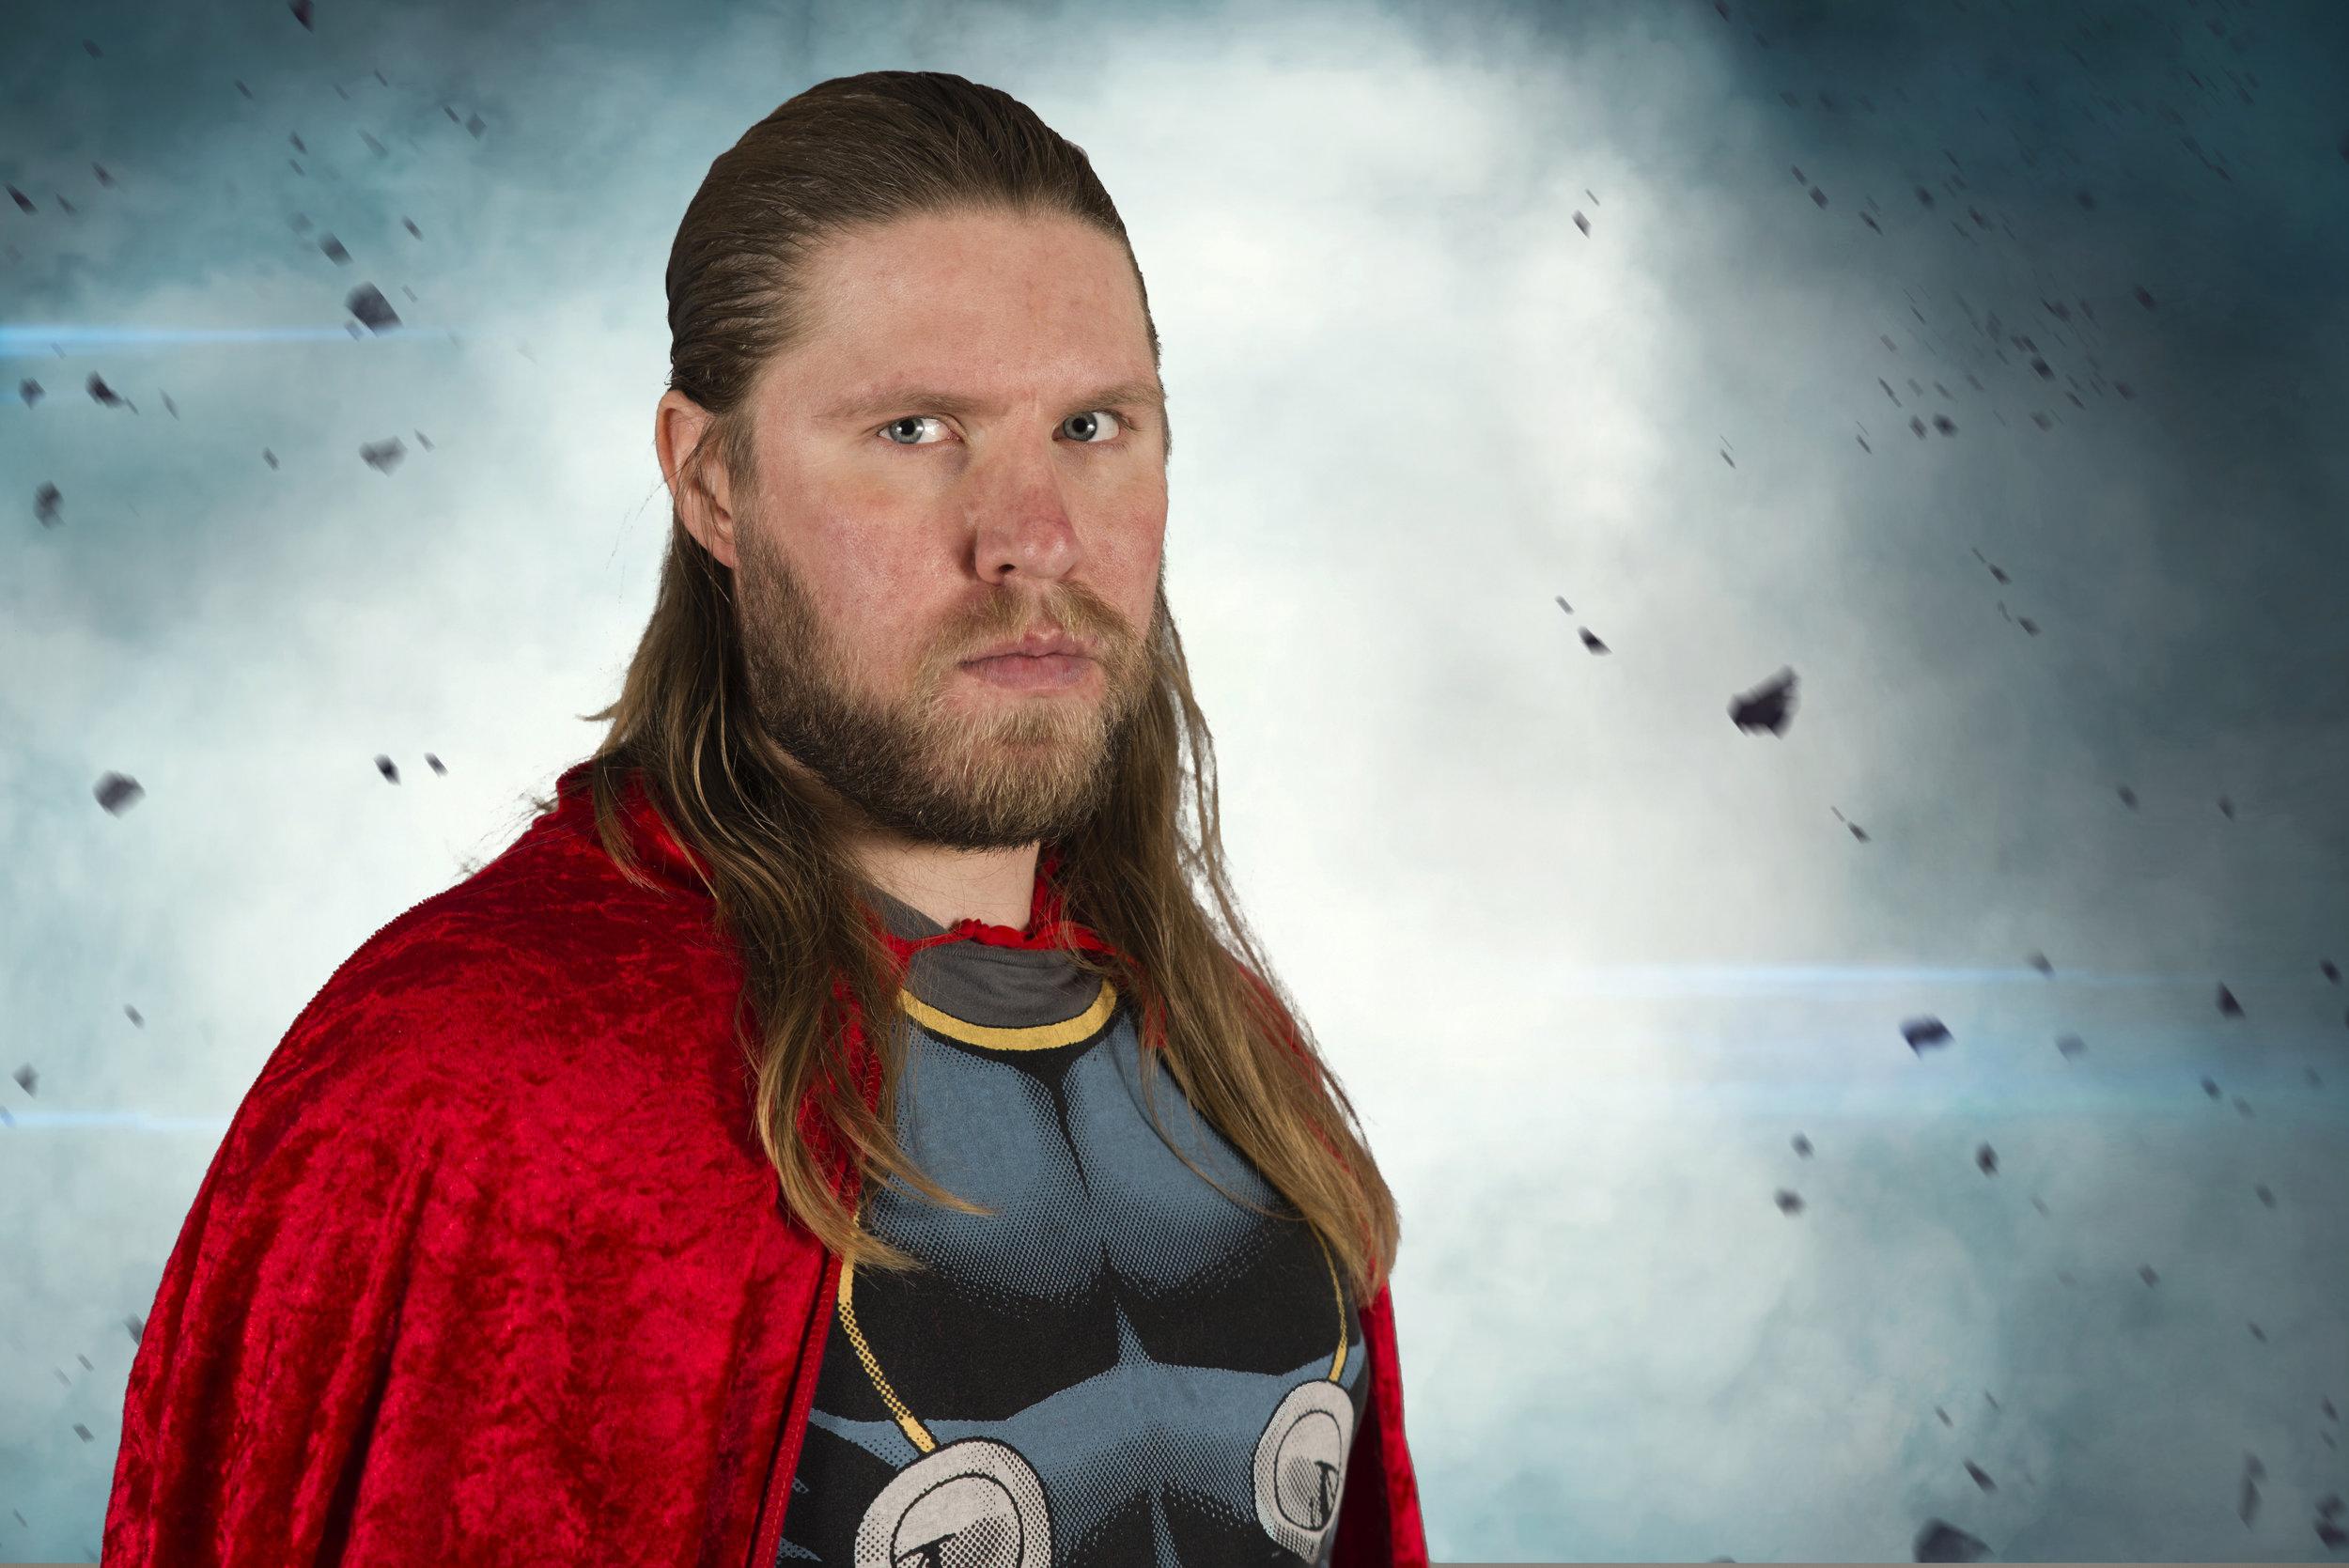 Thor-portrait-session1.jpg